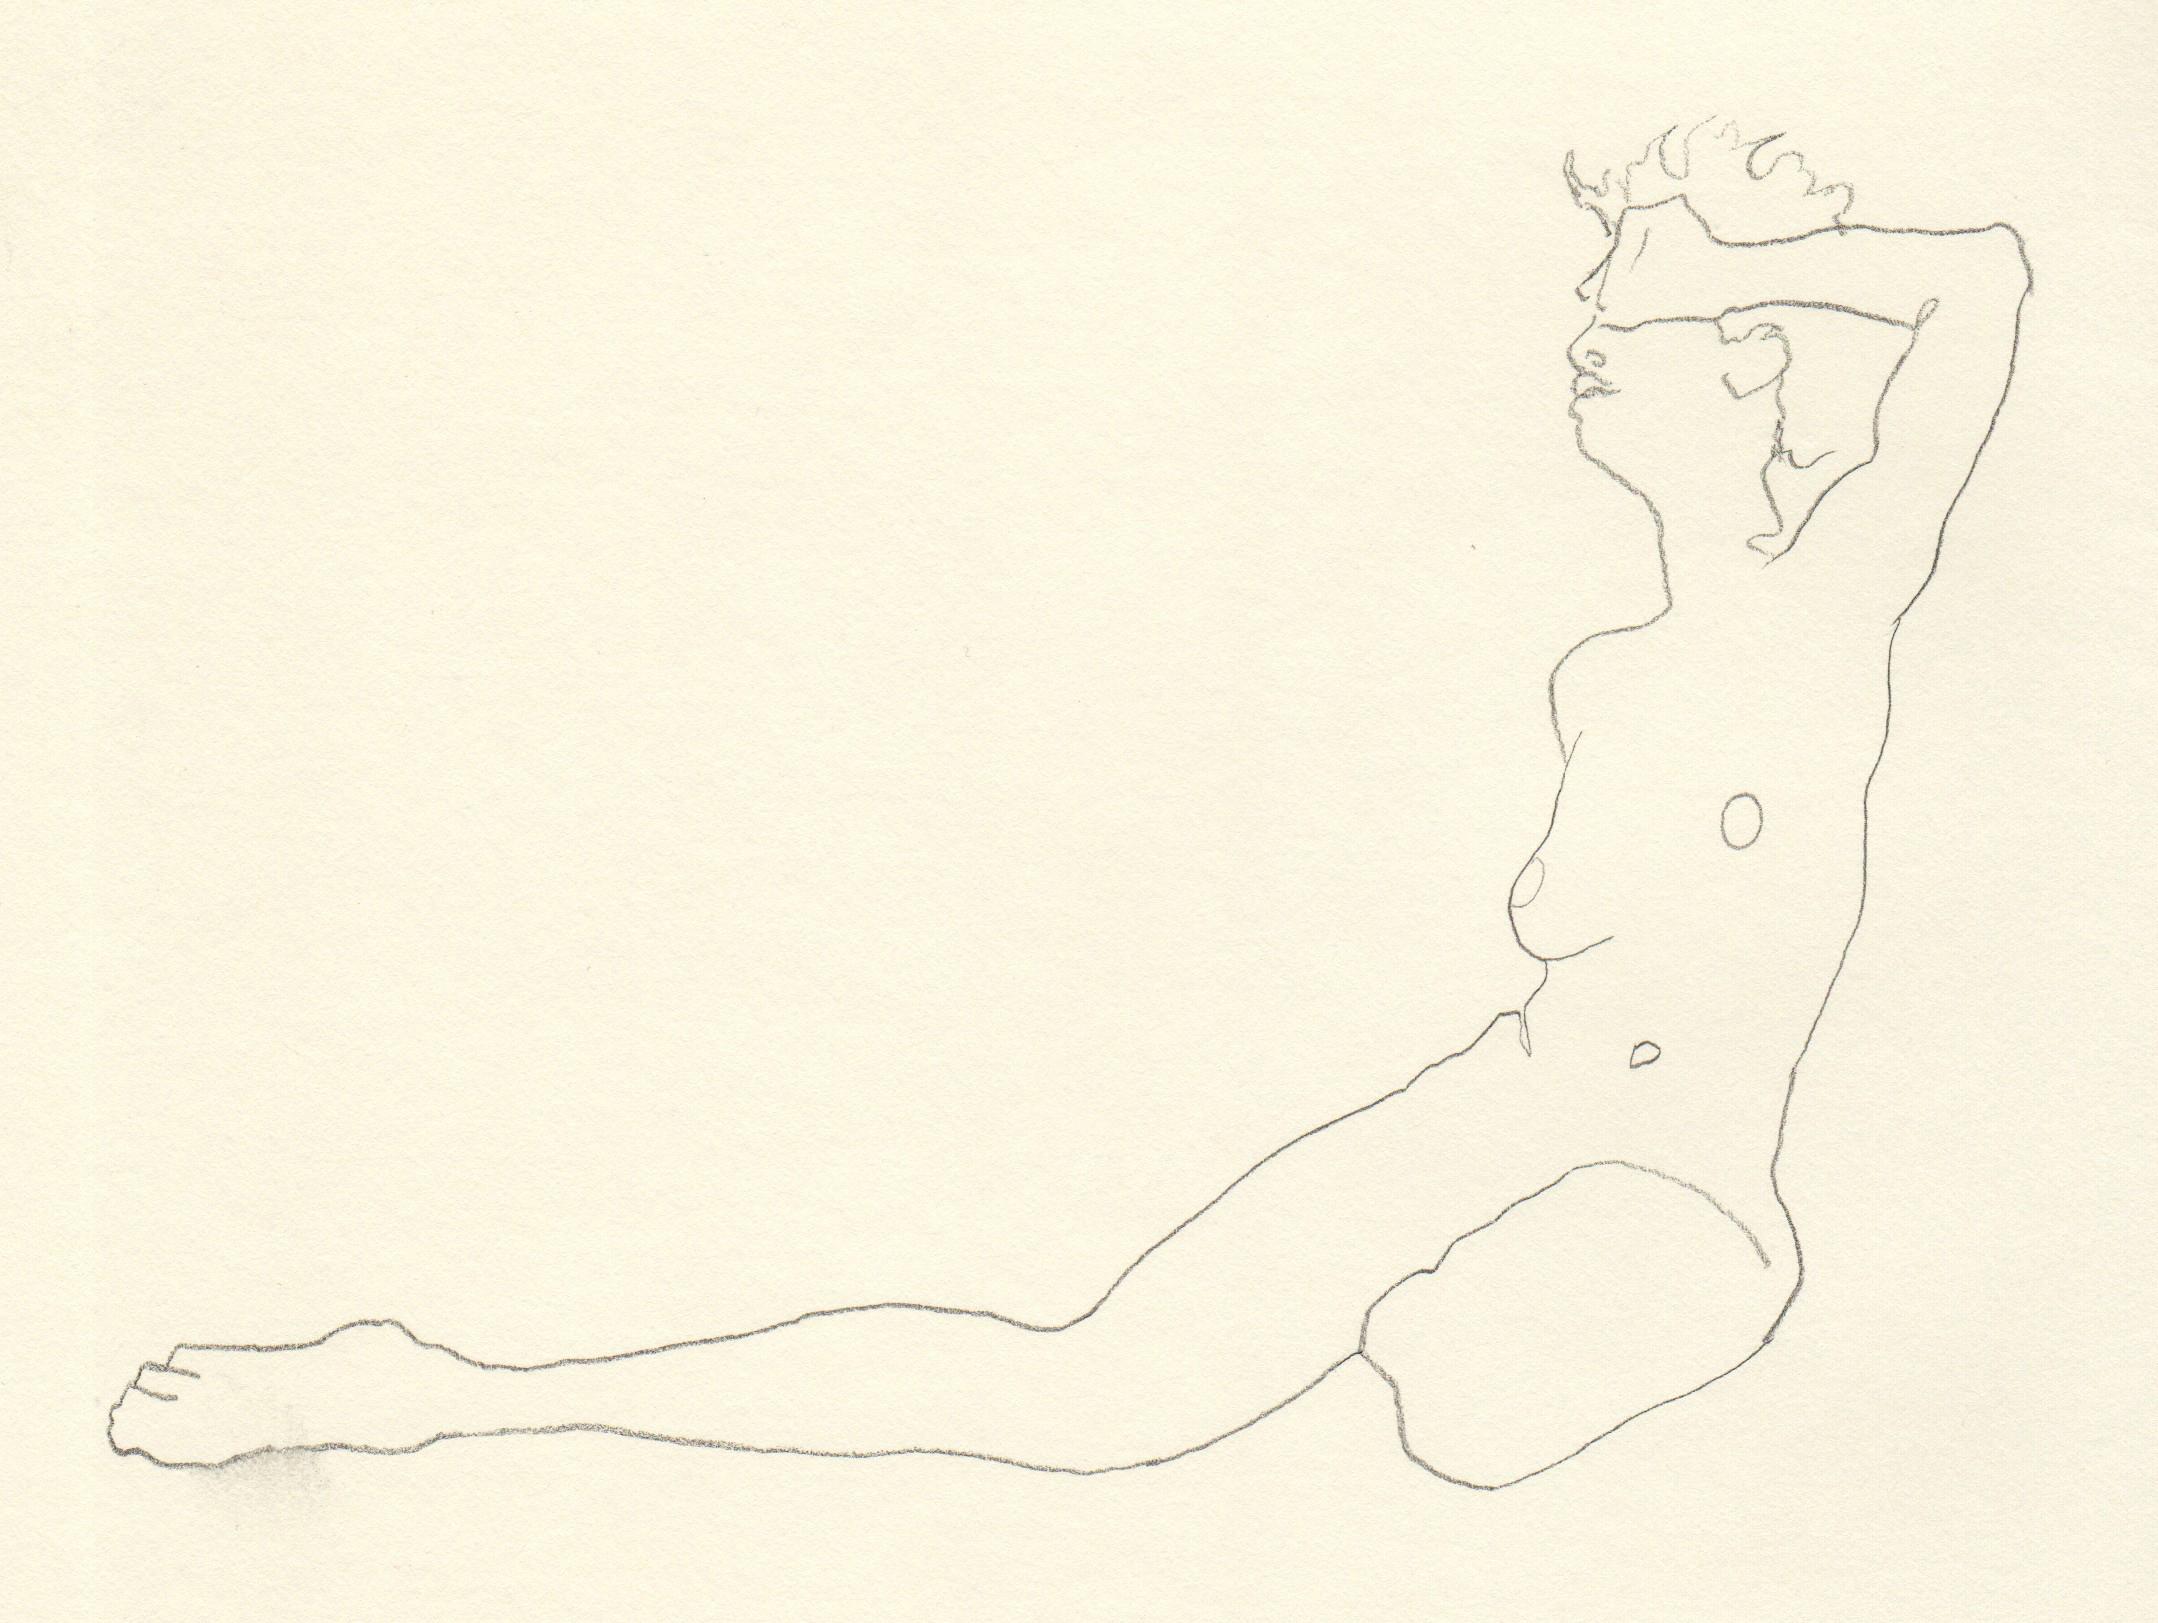 2014_Sketch_F-Beudin_06